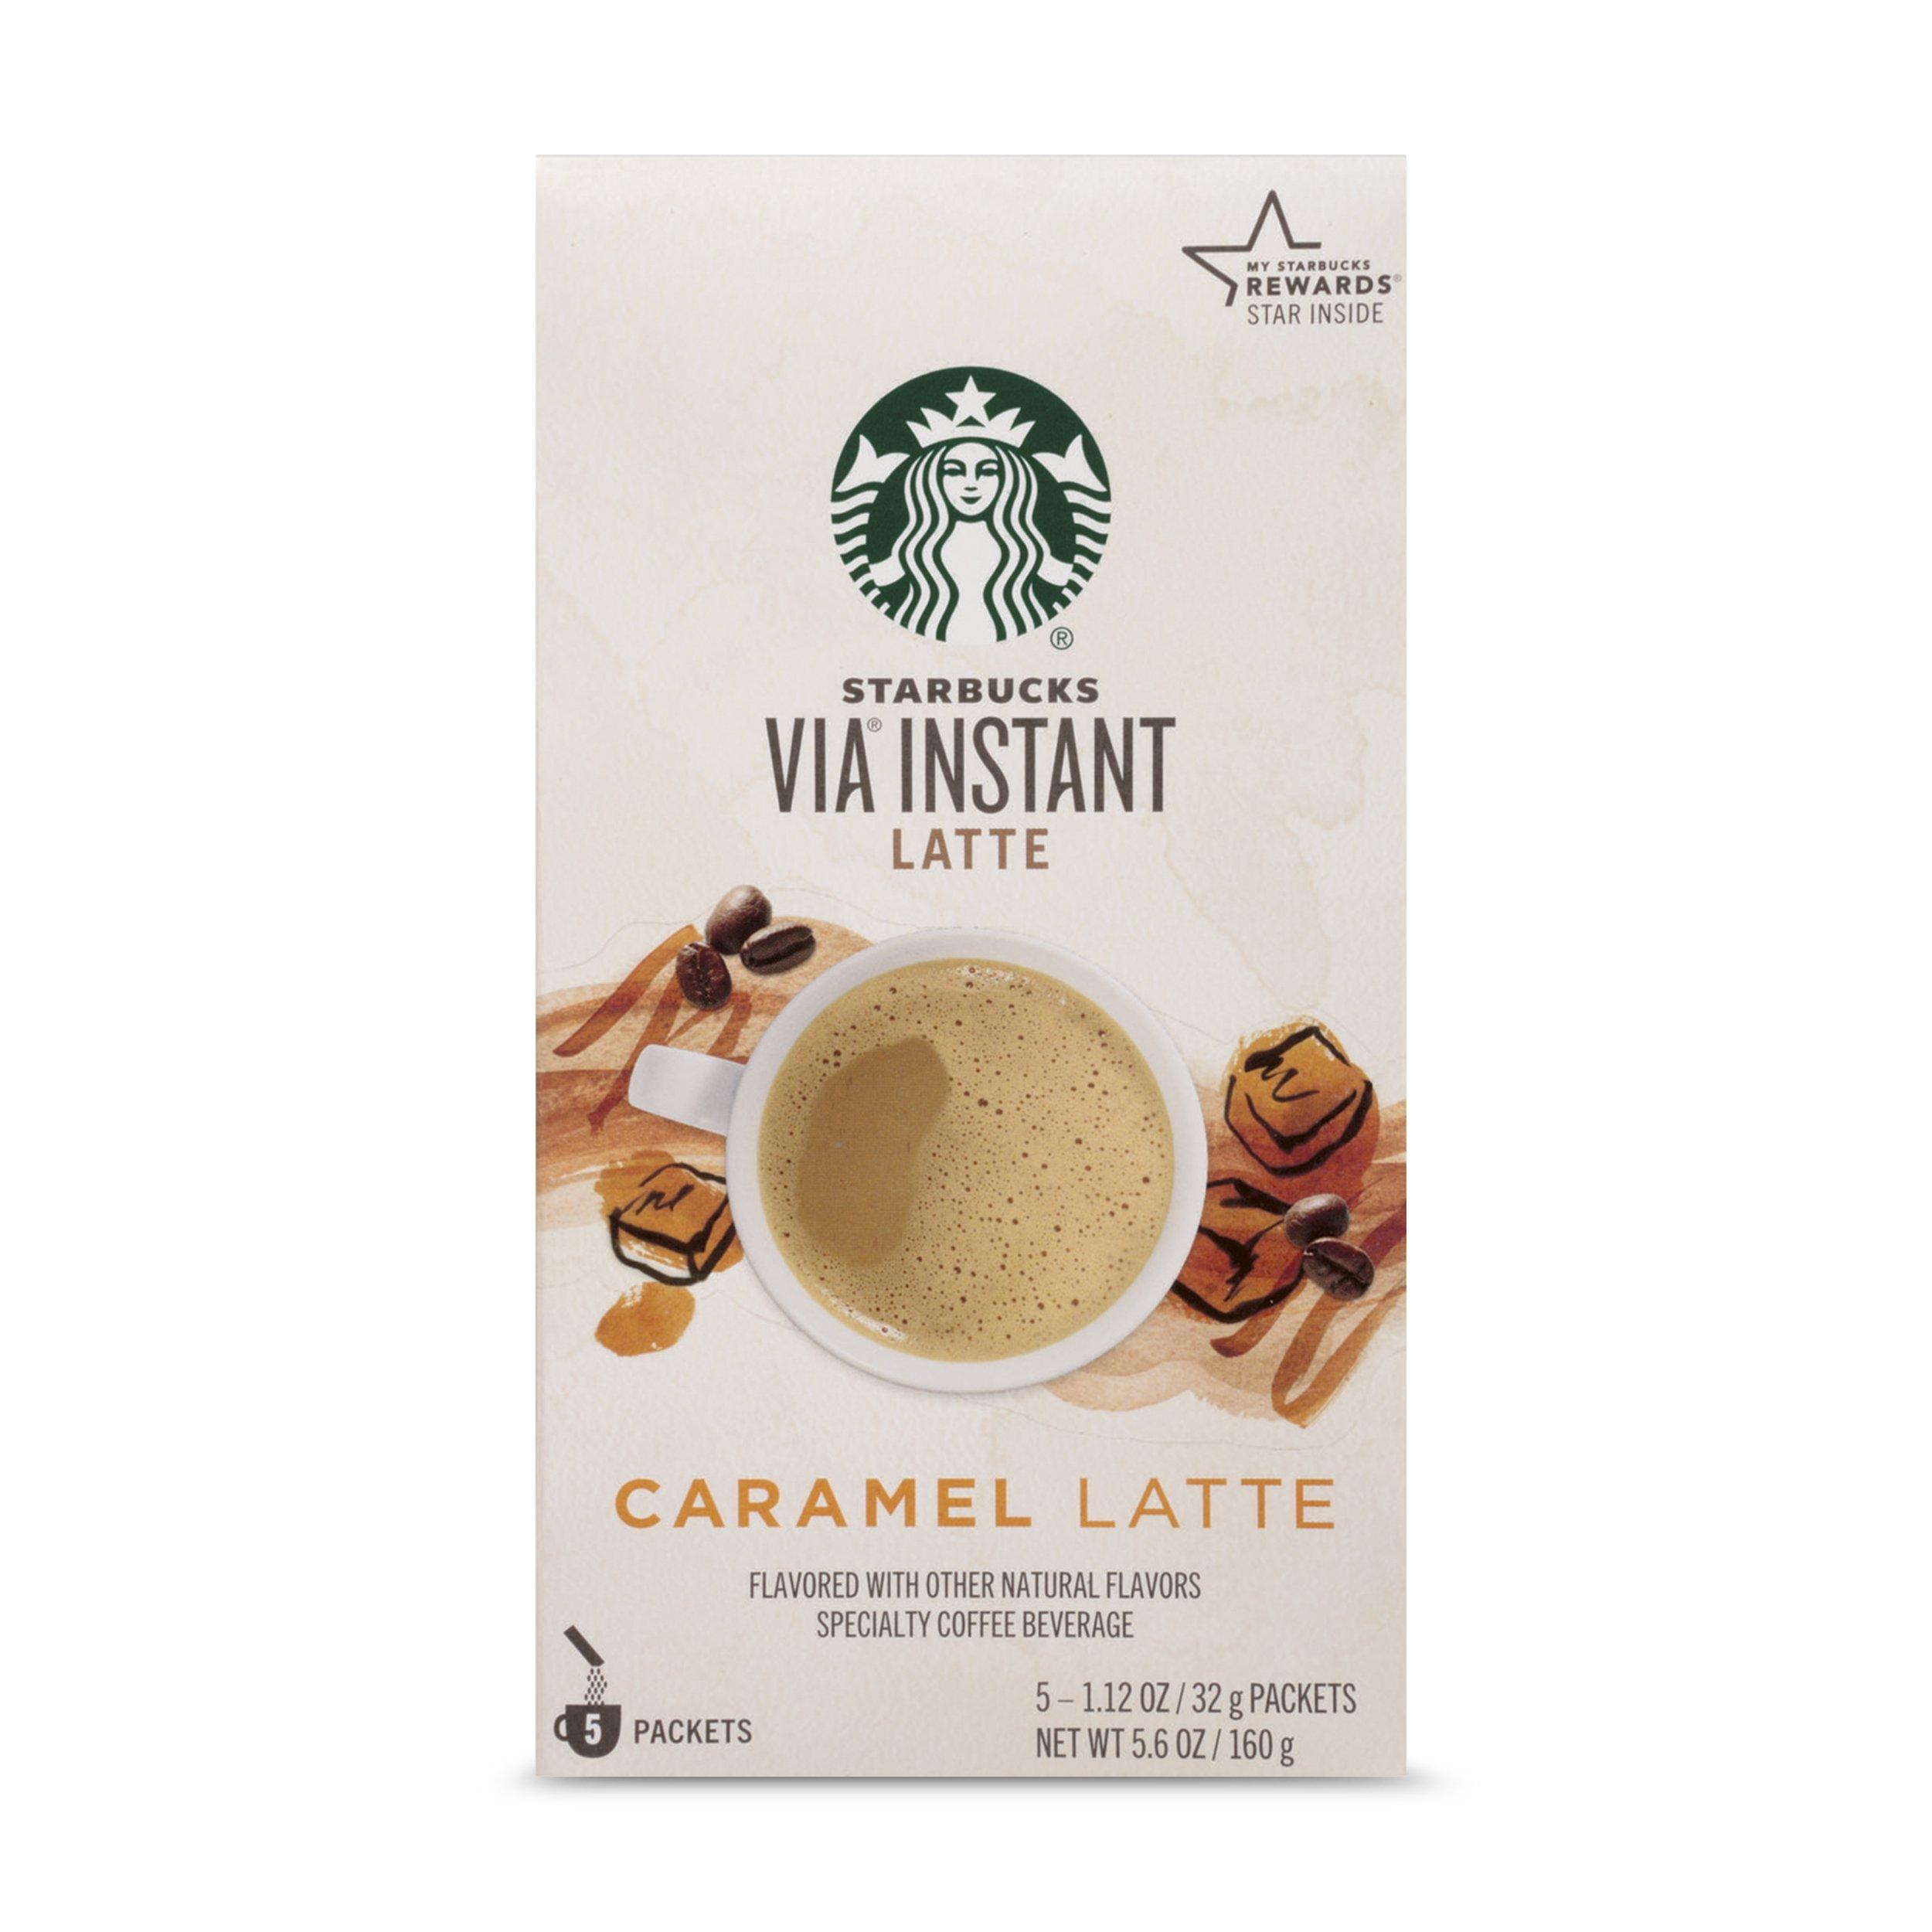 Starbucks VIA Instant Coffee, Caramel Latte, 5 Count